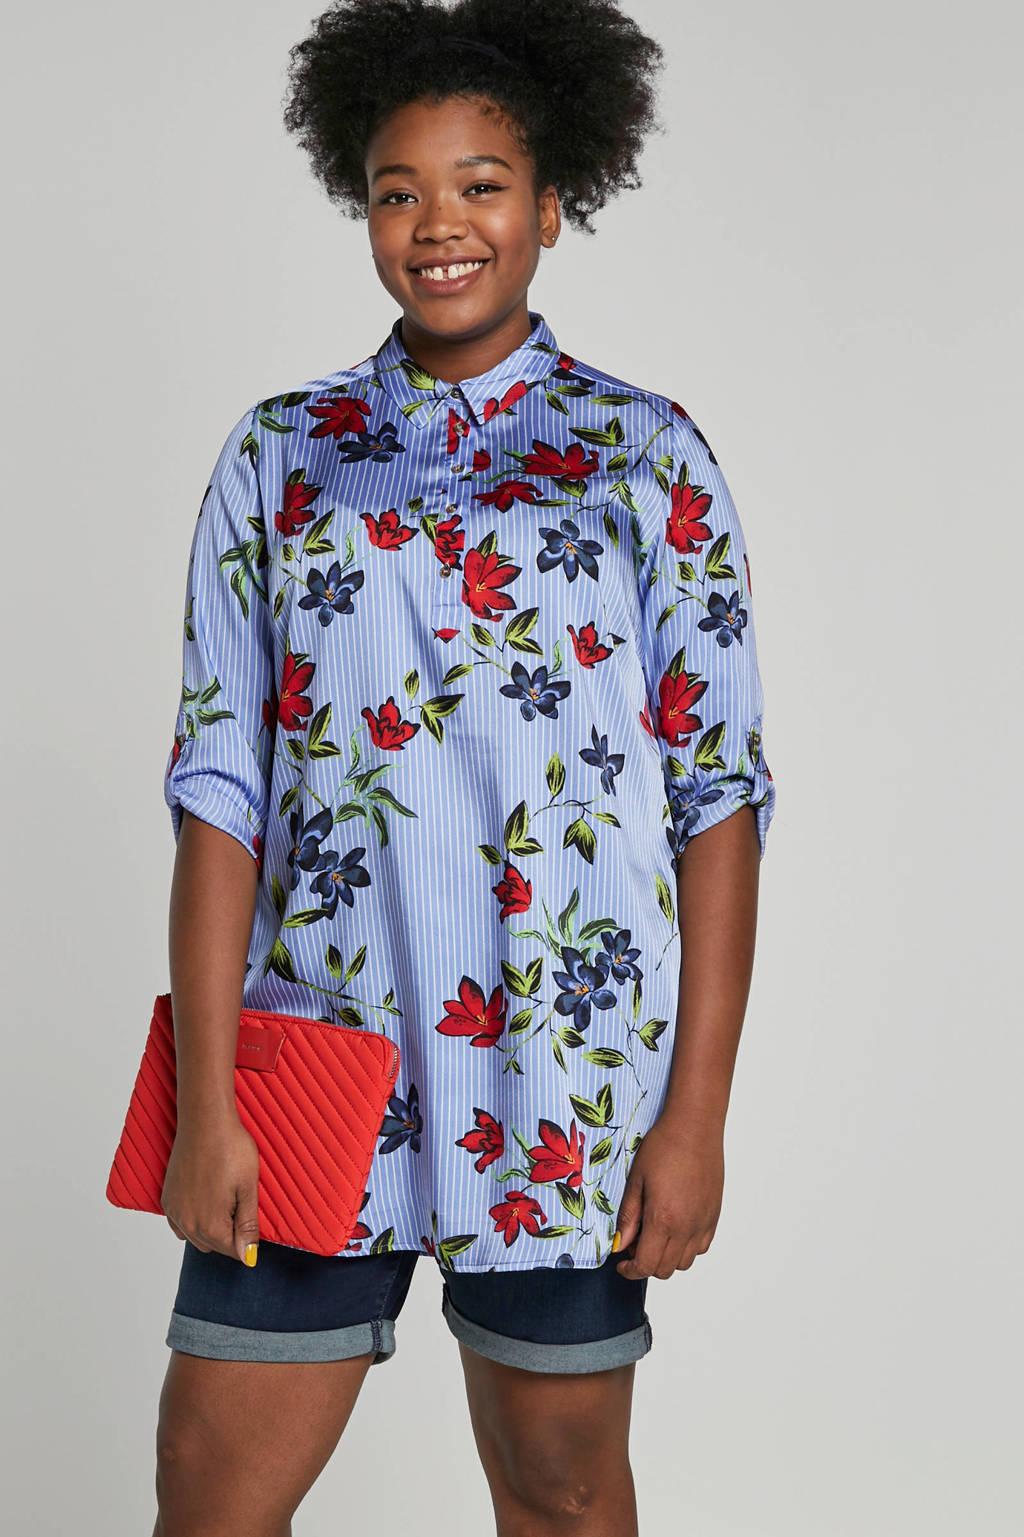 whkmp's great looks tuniek met streep- en bloemenprint, Blauw/wit/rood